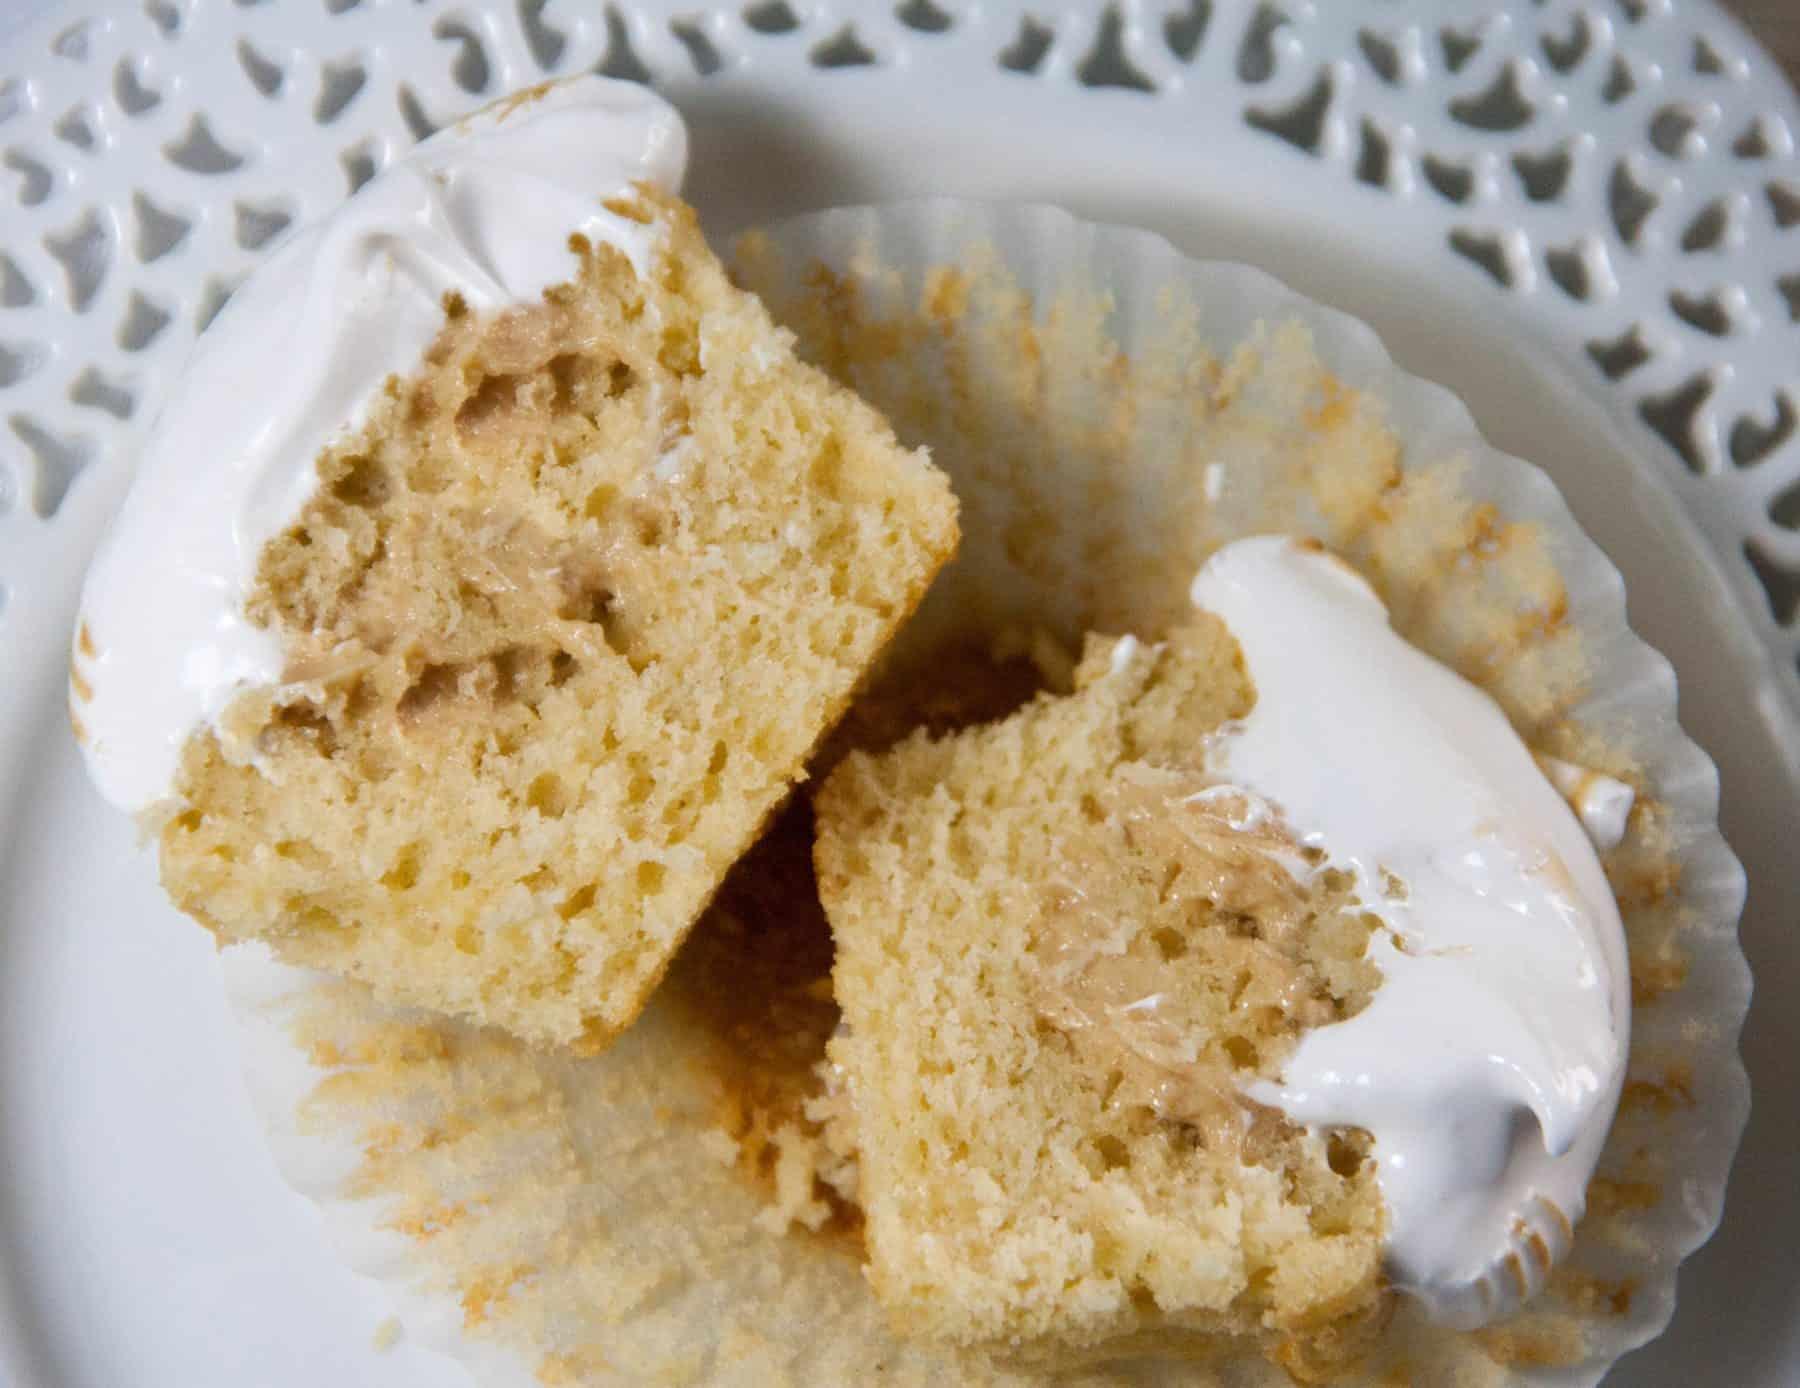 cupcake cut in half on a plate